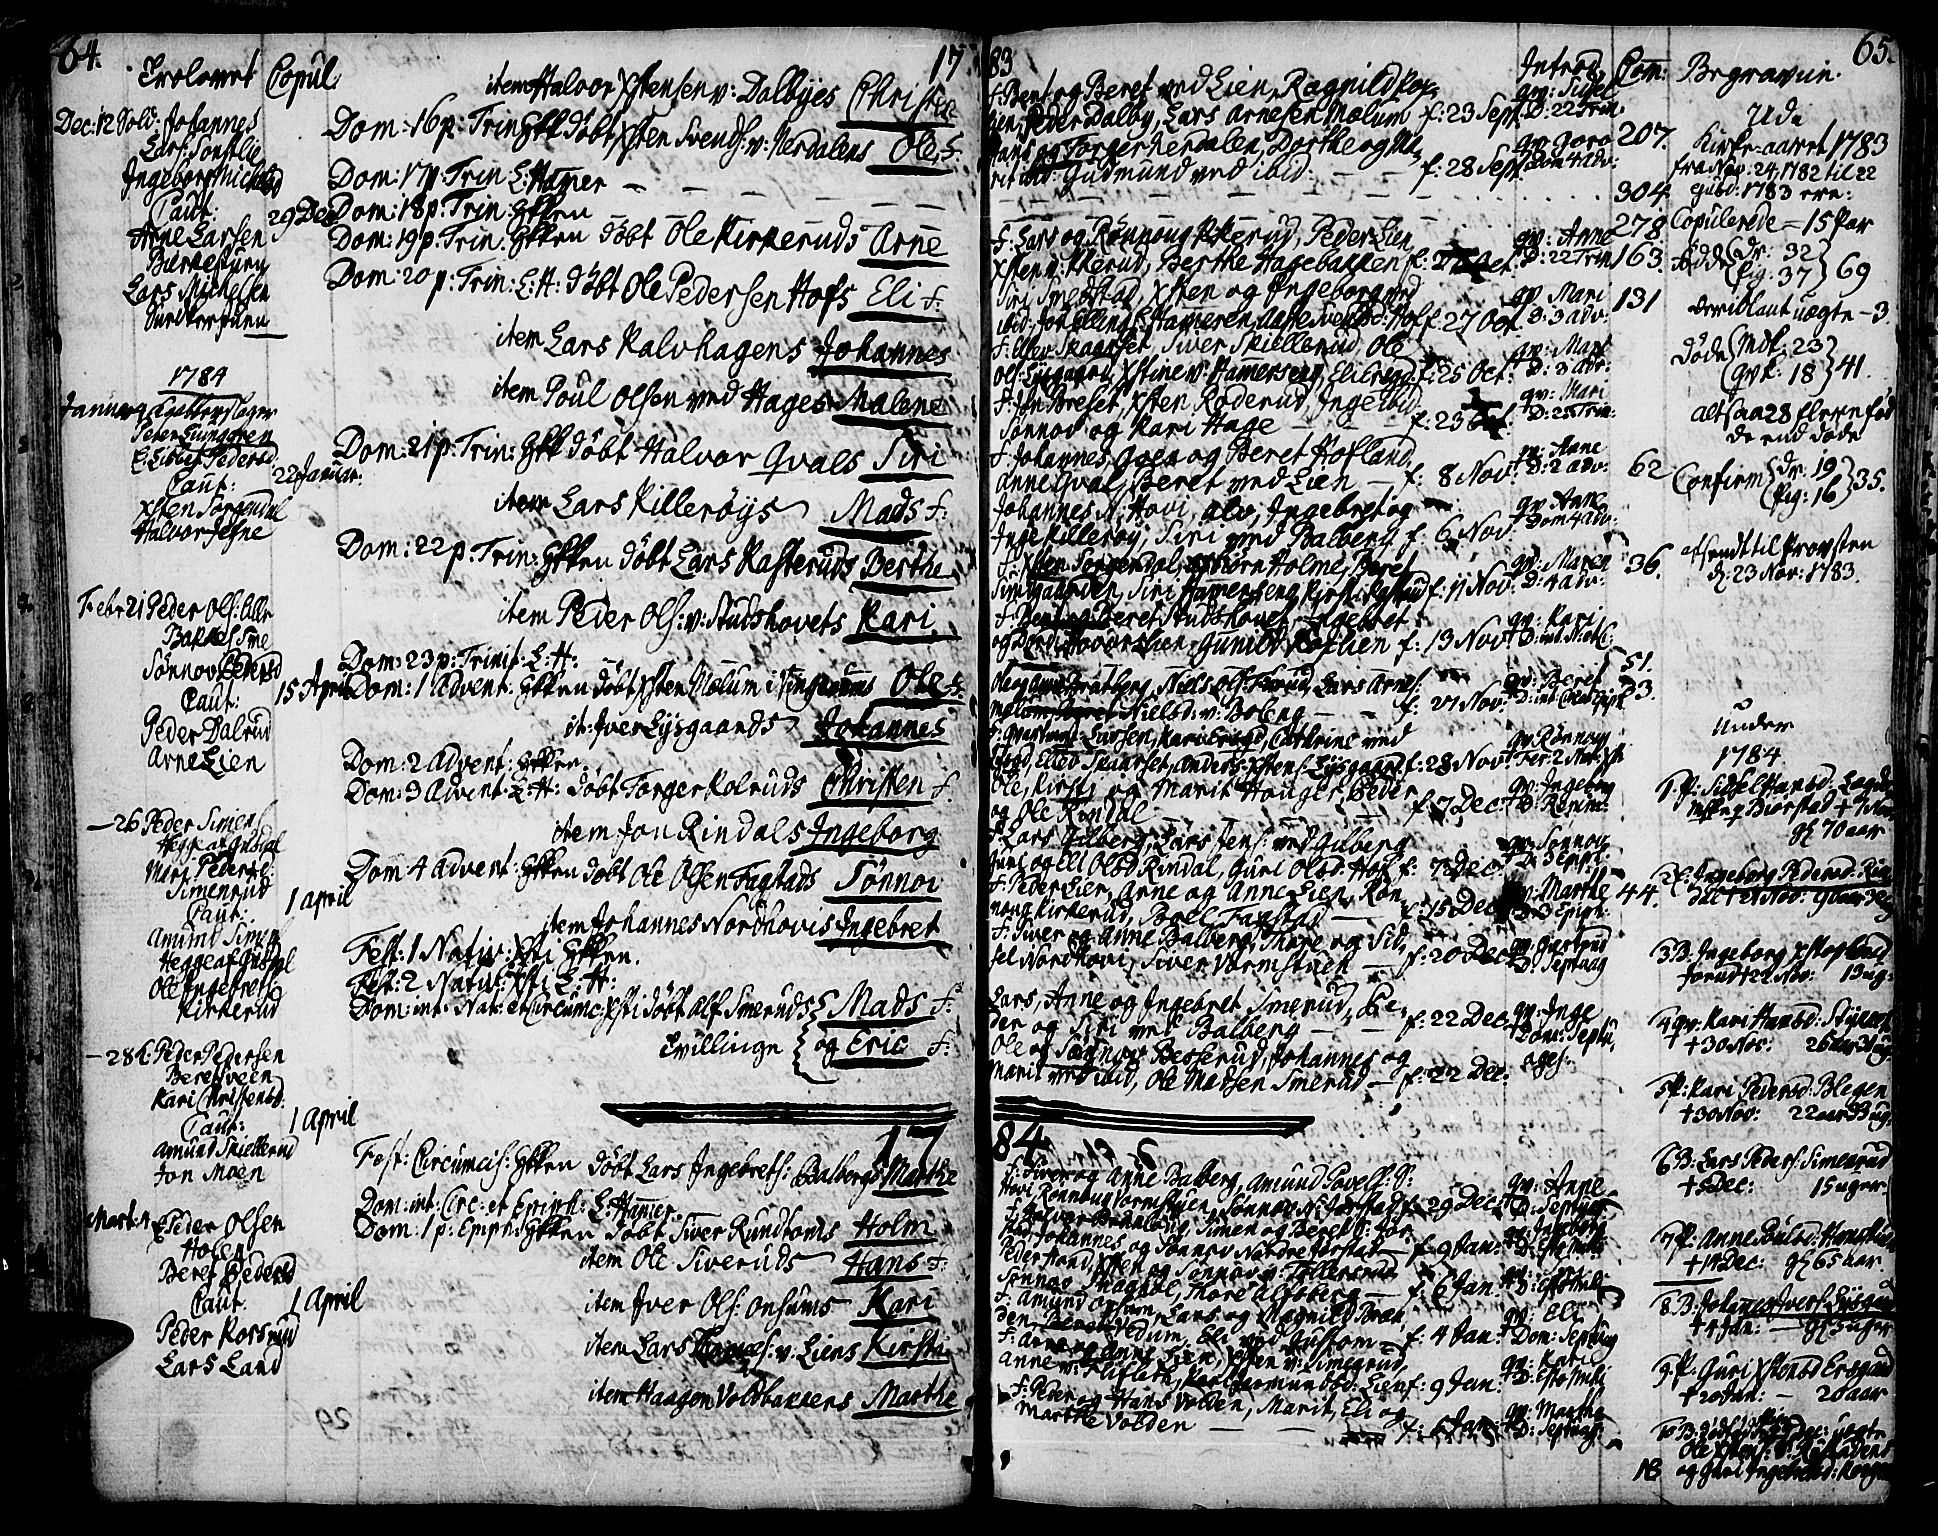 SAH, Fåberg prestekontor, Ministerialbok nr. 2, 1775-1818, s. 64-65